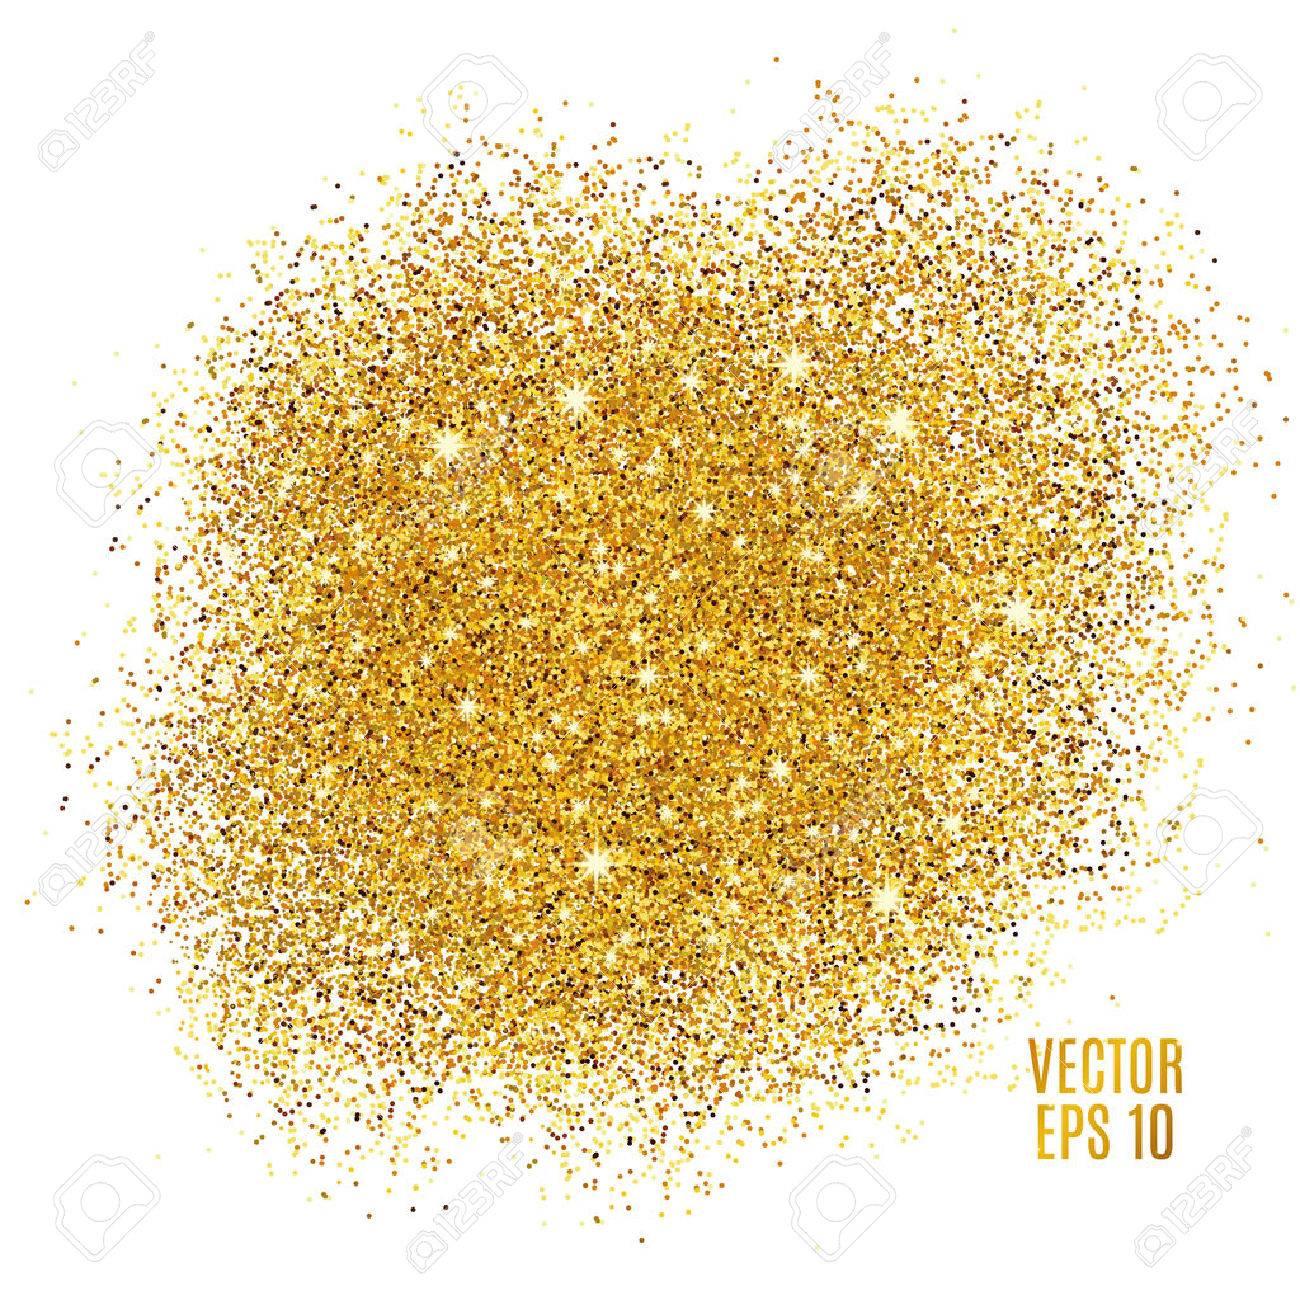 Gold sparkles on white background. Gold glitter background. Gold background for card, vip, exclusive. Gold certificate, gift, luxury privilege. Voucher store present, shopping. - 52729573